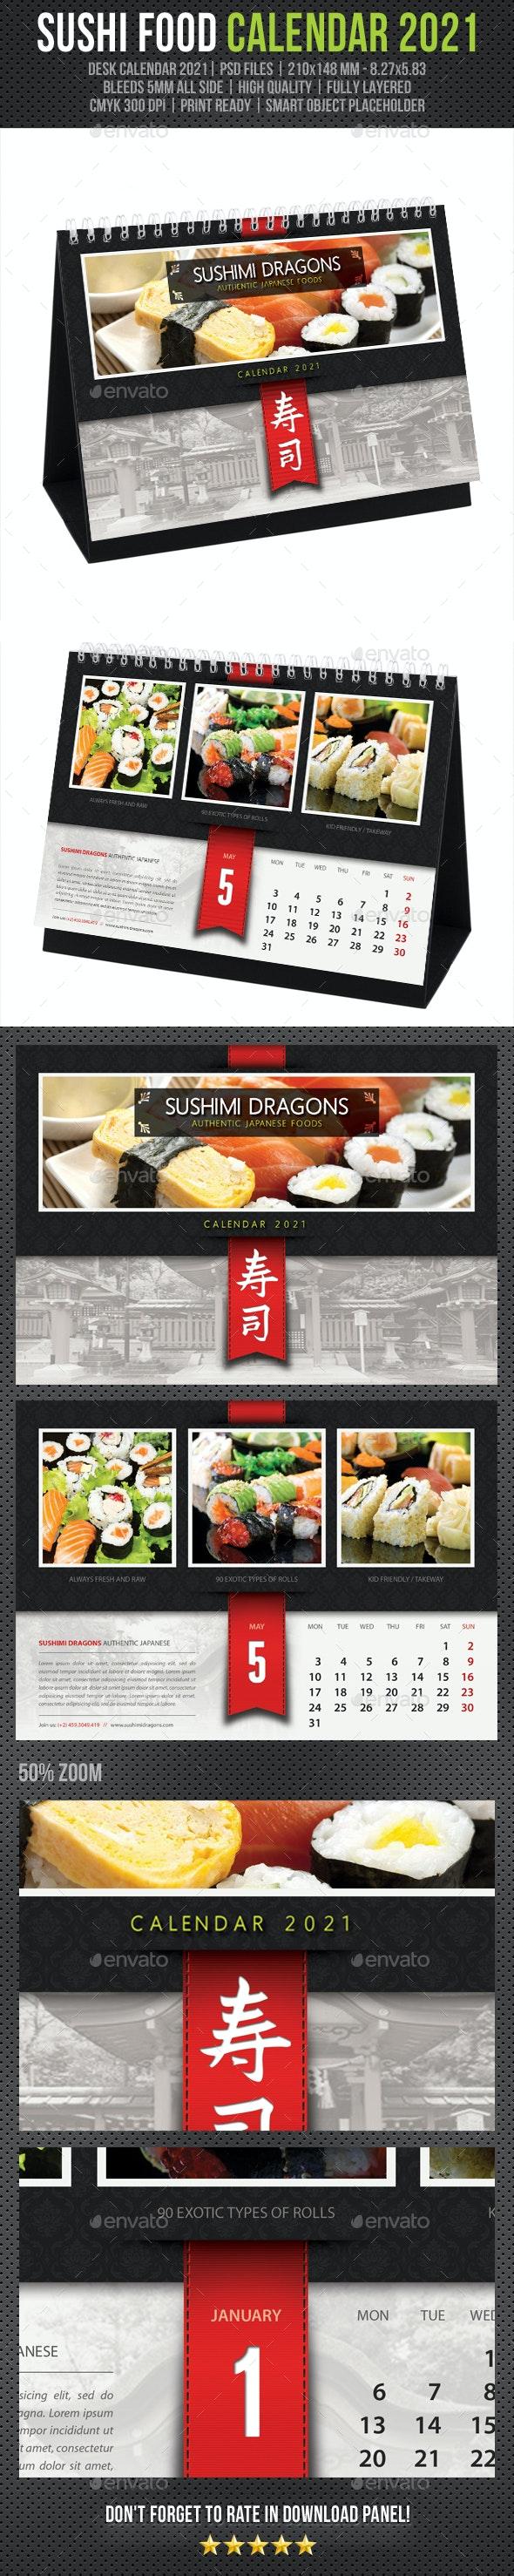 Sushi Restaurant Desk Calendar 2021 - Calendars Stationery